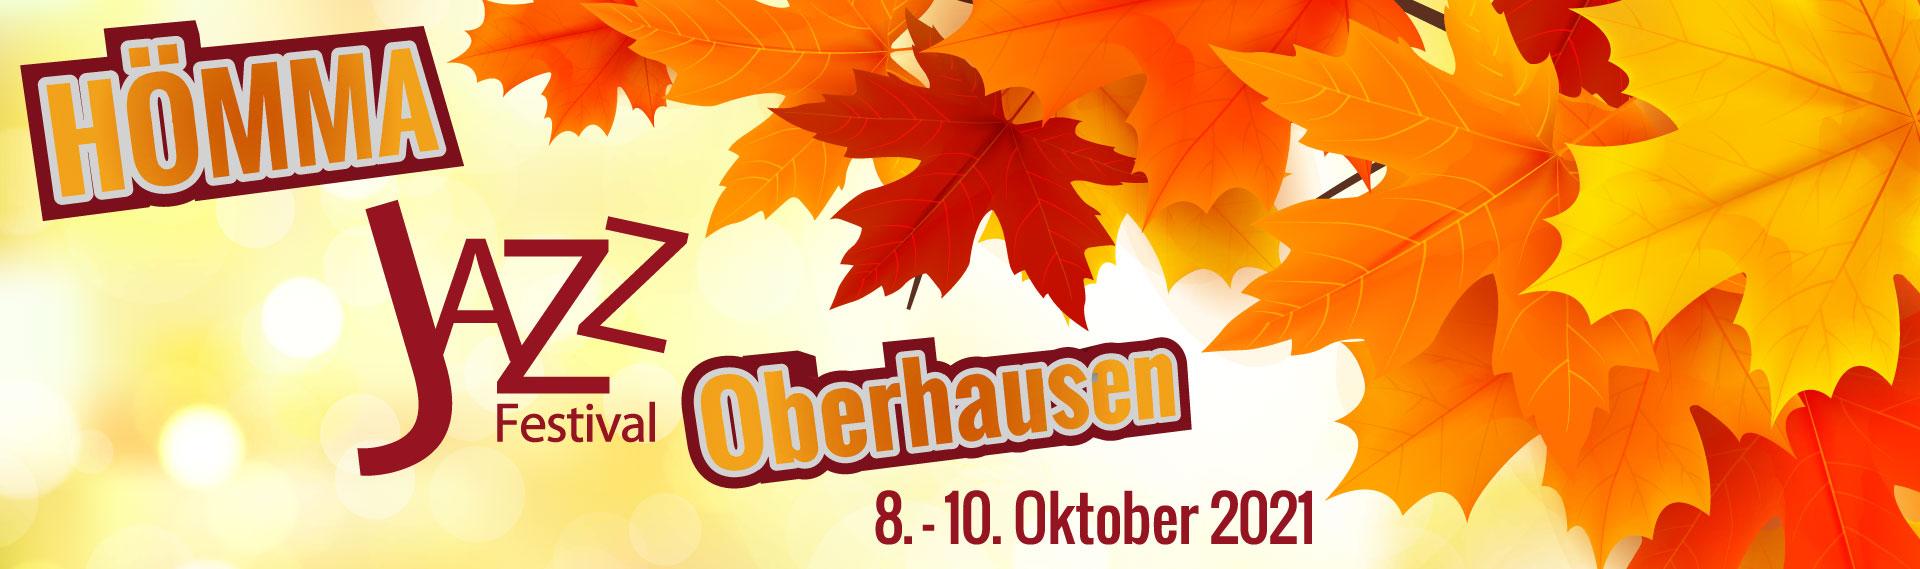 HÖMMA 21 – Das Jazzfestival in Oberhausen